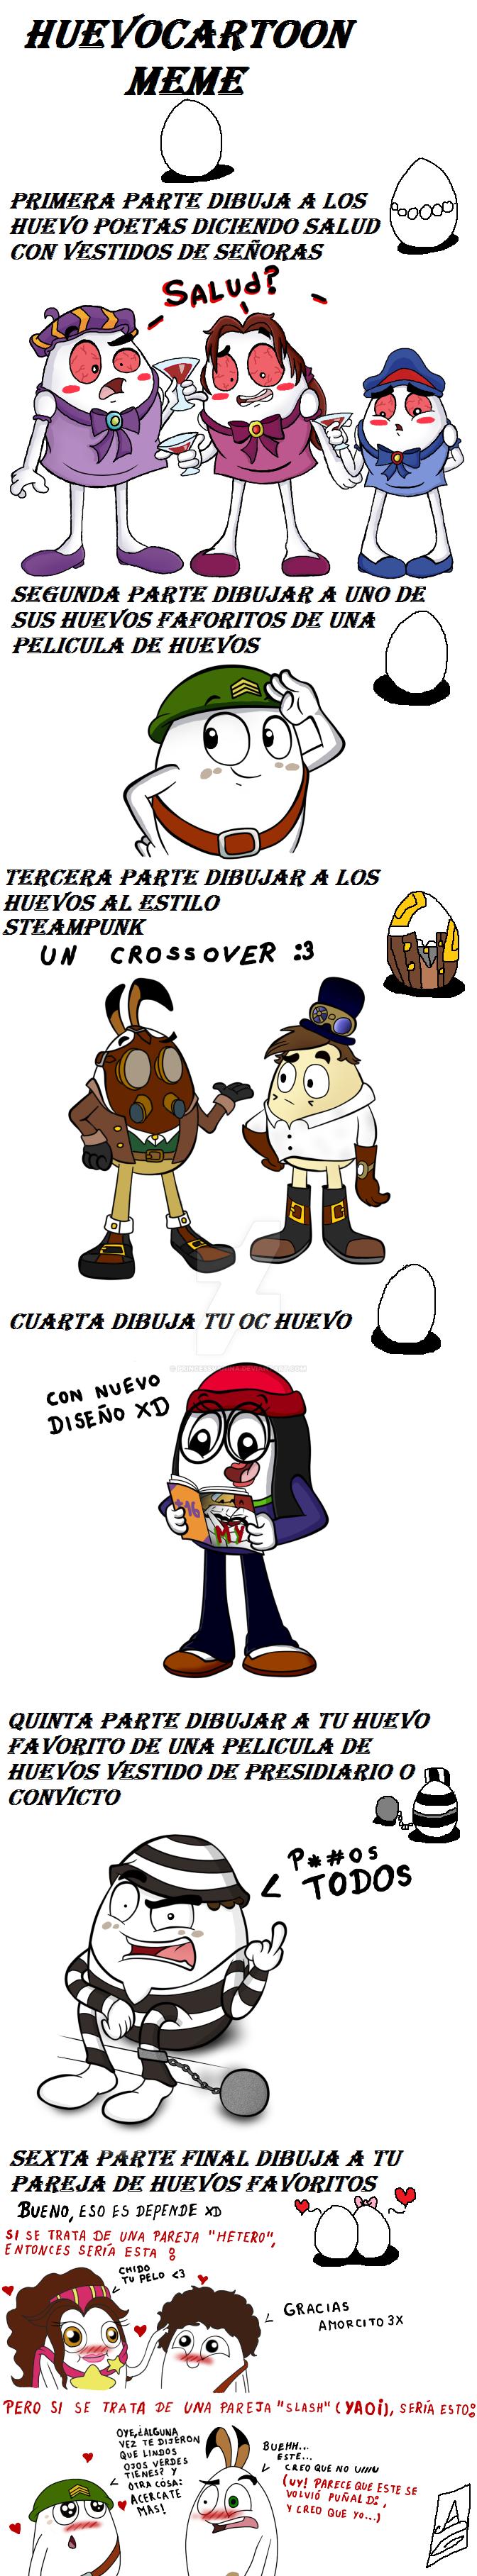 Huevocartoon Meme By Princessvanina On Deviantart